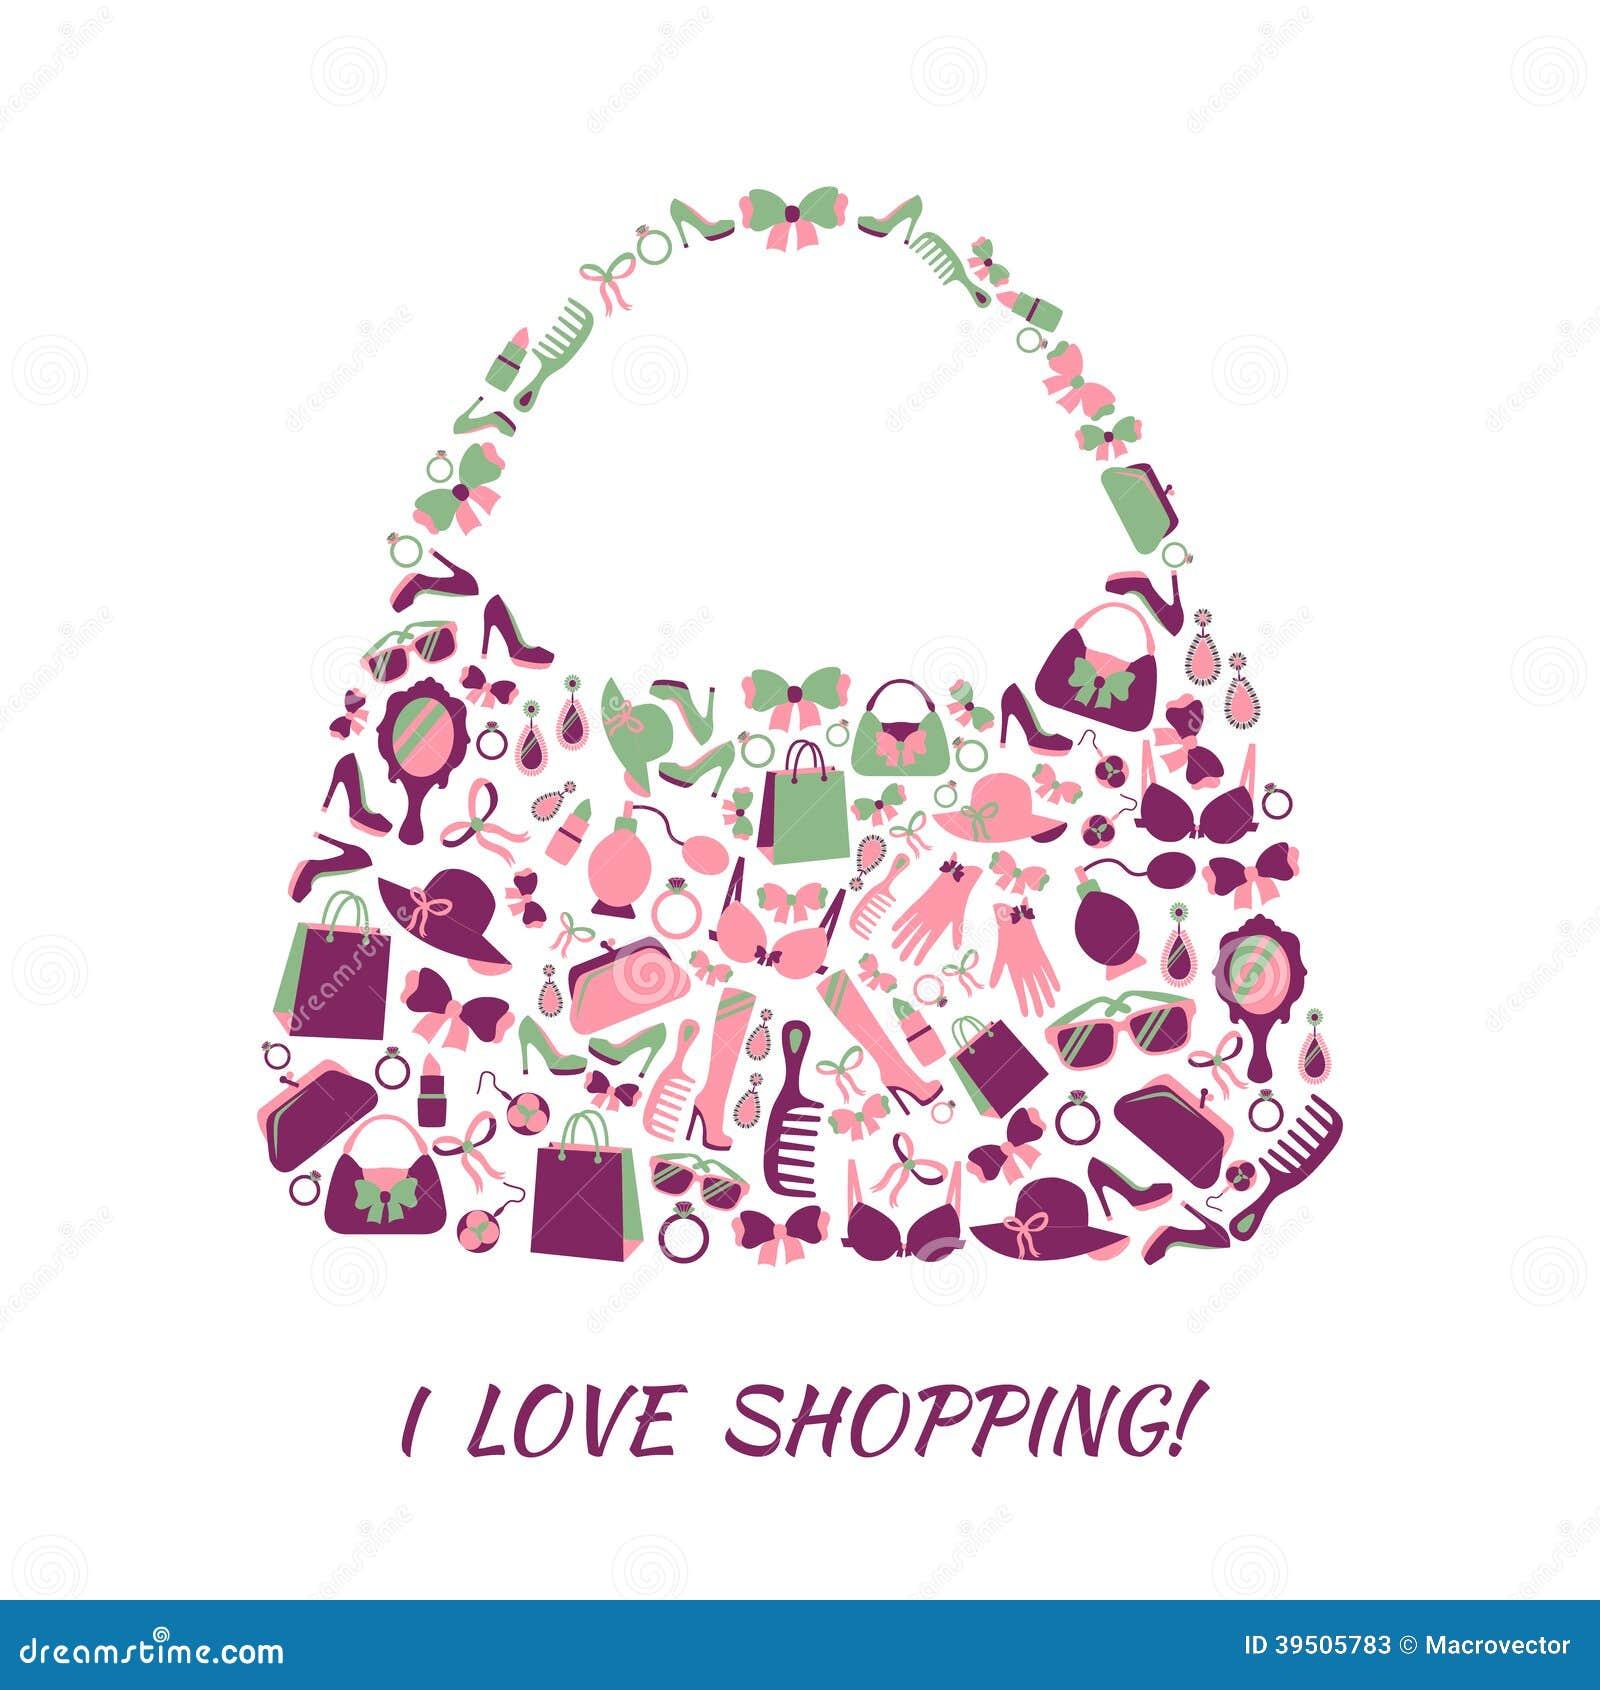 i love bags wallpaper - photo #13